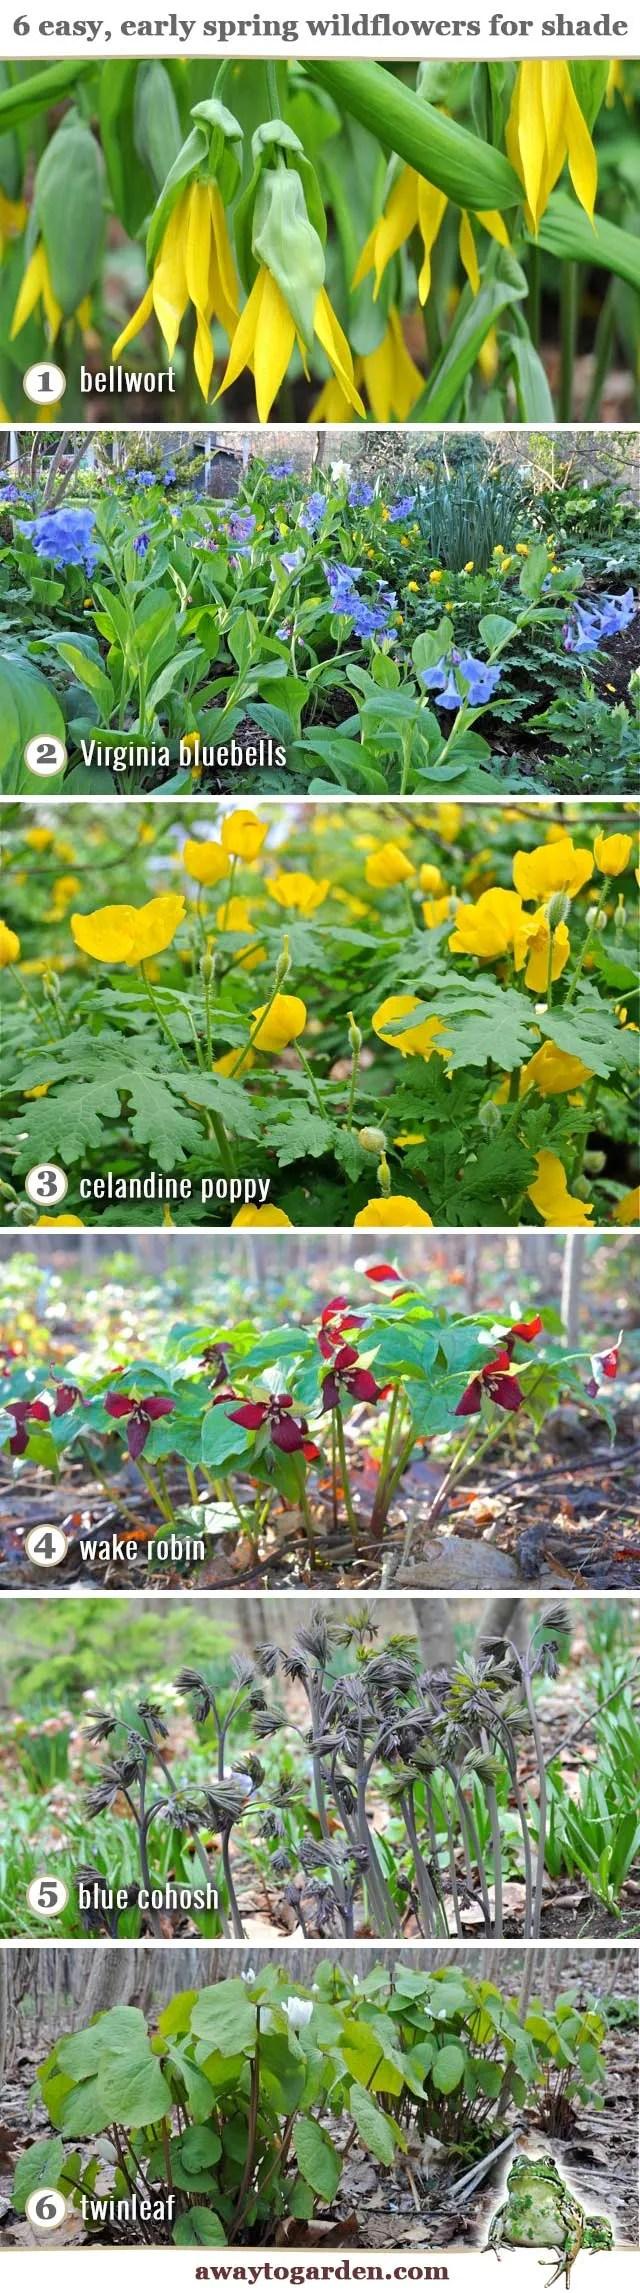 6-Wildflowers-for-shadeNAMES